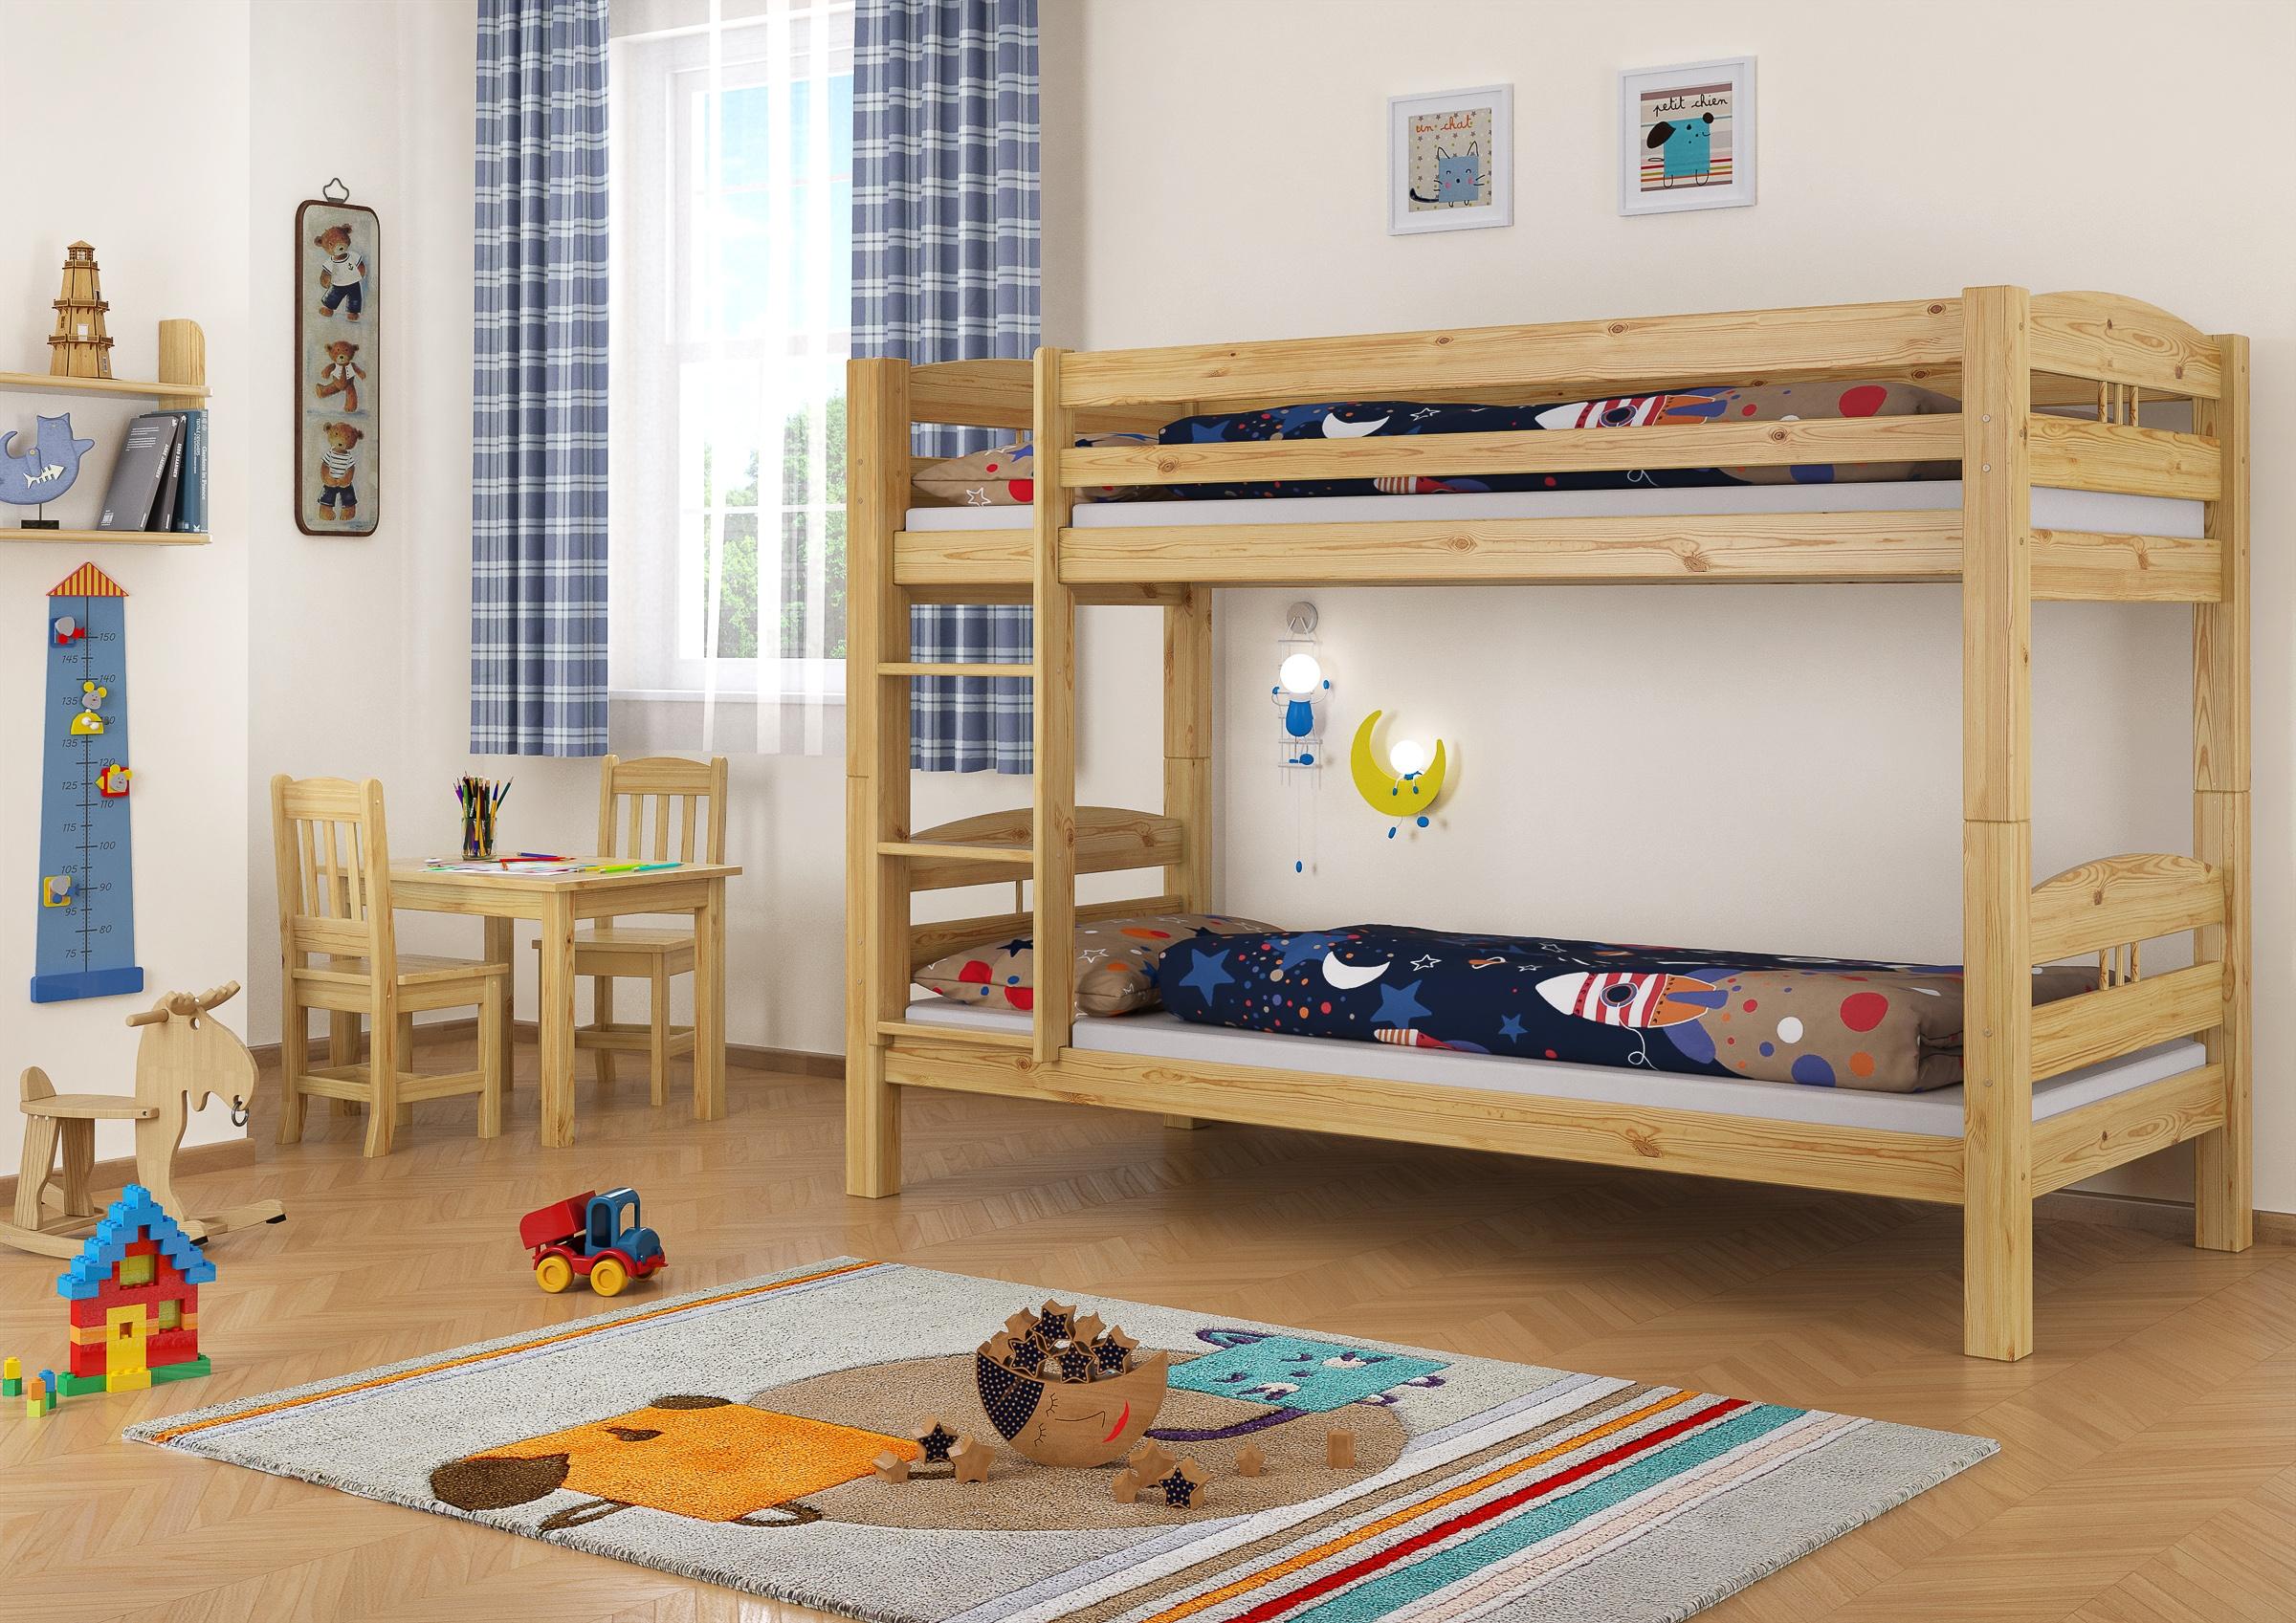 Anspruchsvoll Doppelbett Kinderzimmer Referenz Von Stockbett Etagenbett Kiefer 90x200 Massives Hochbett F.